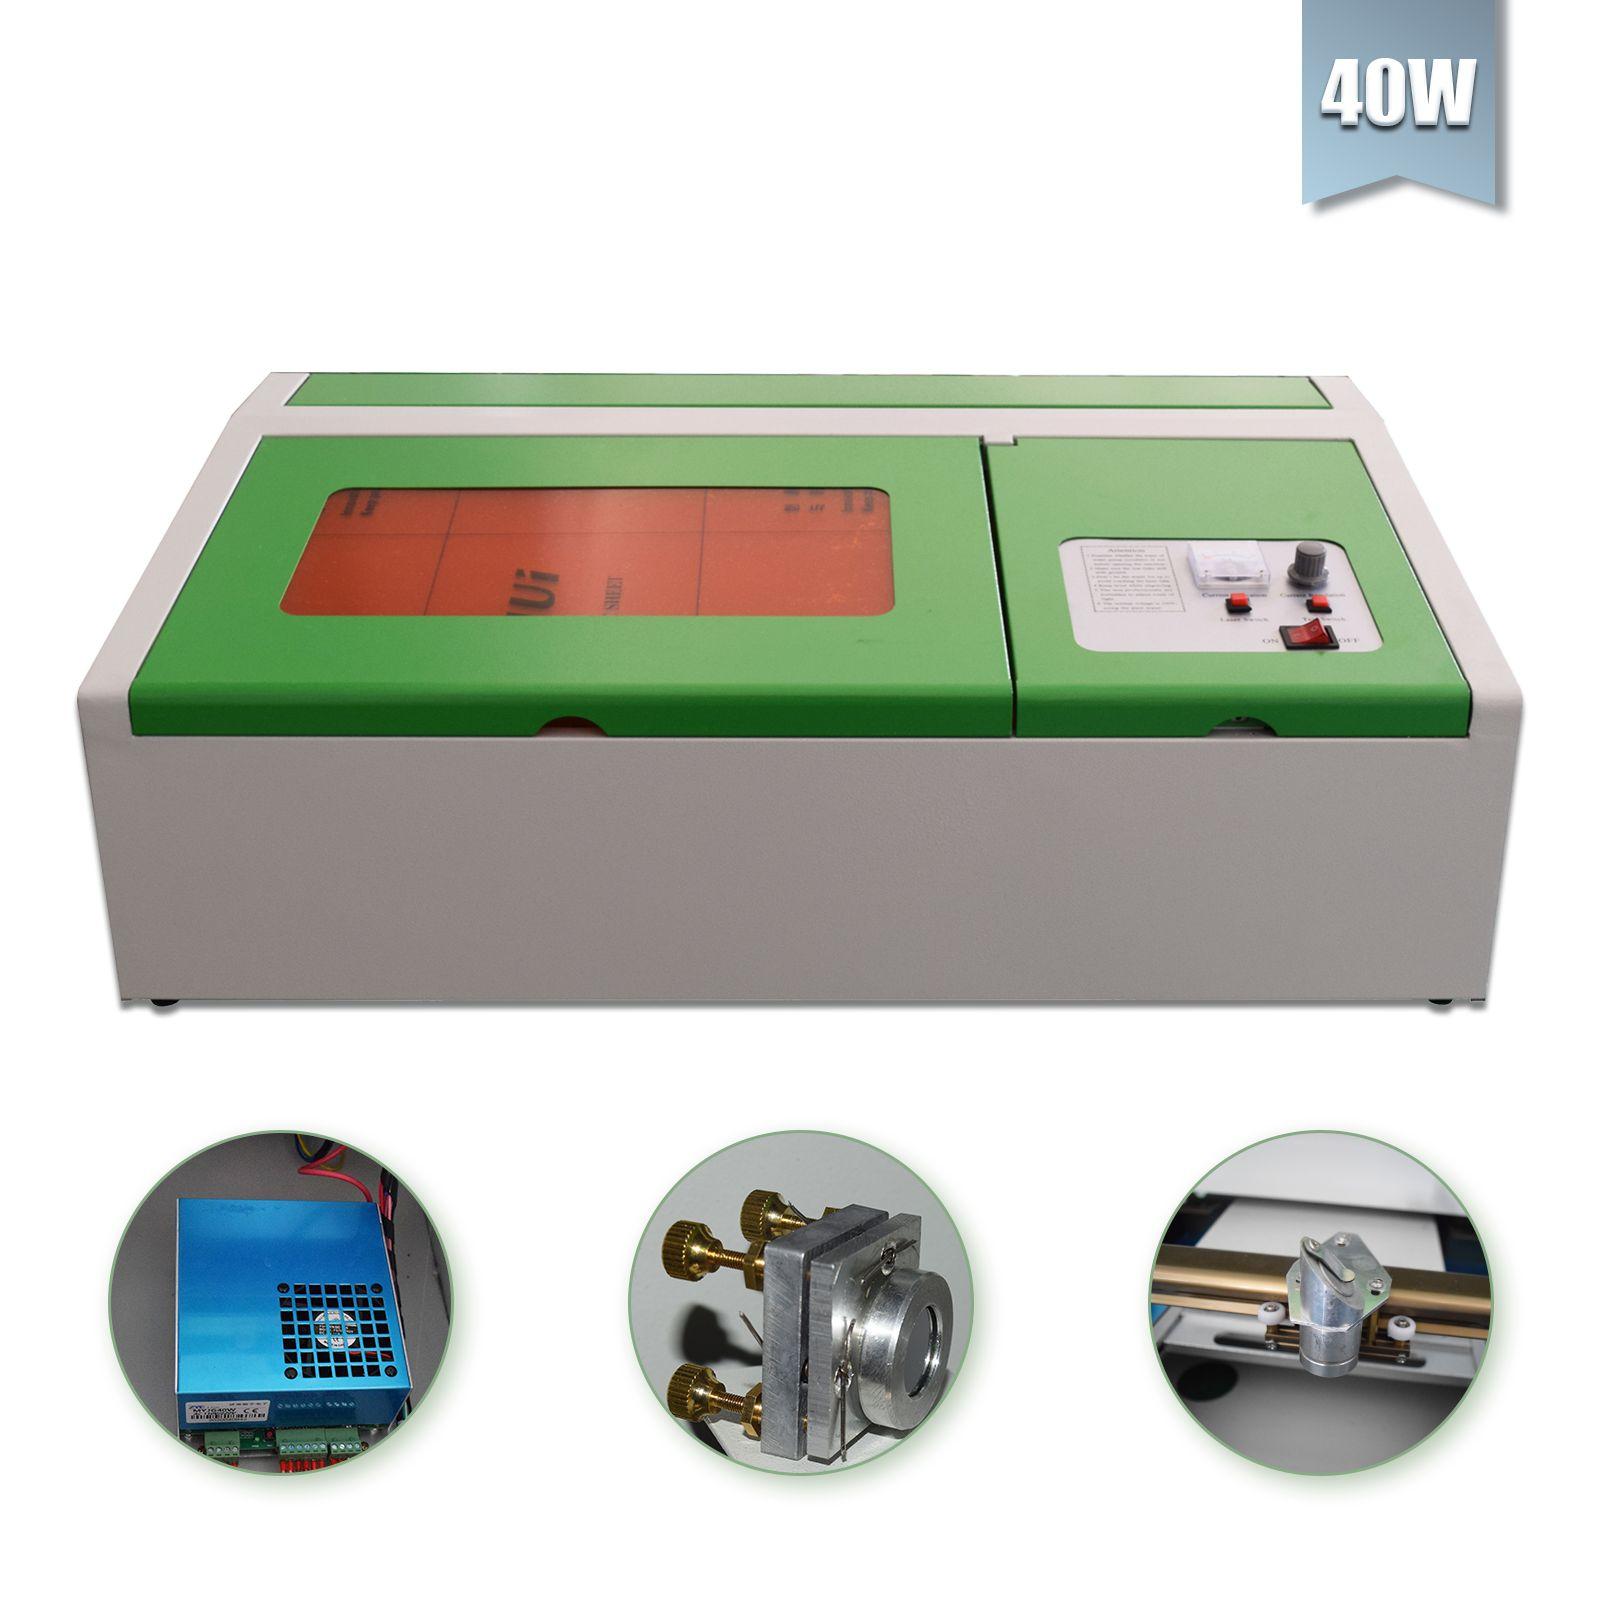 40W CO2 ليزر كتر الليزر وآلة نقش للمعادن 300x200mm ليزر حفارة بروتابلي الخشب عمل فنية أفضل